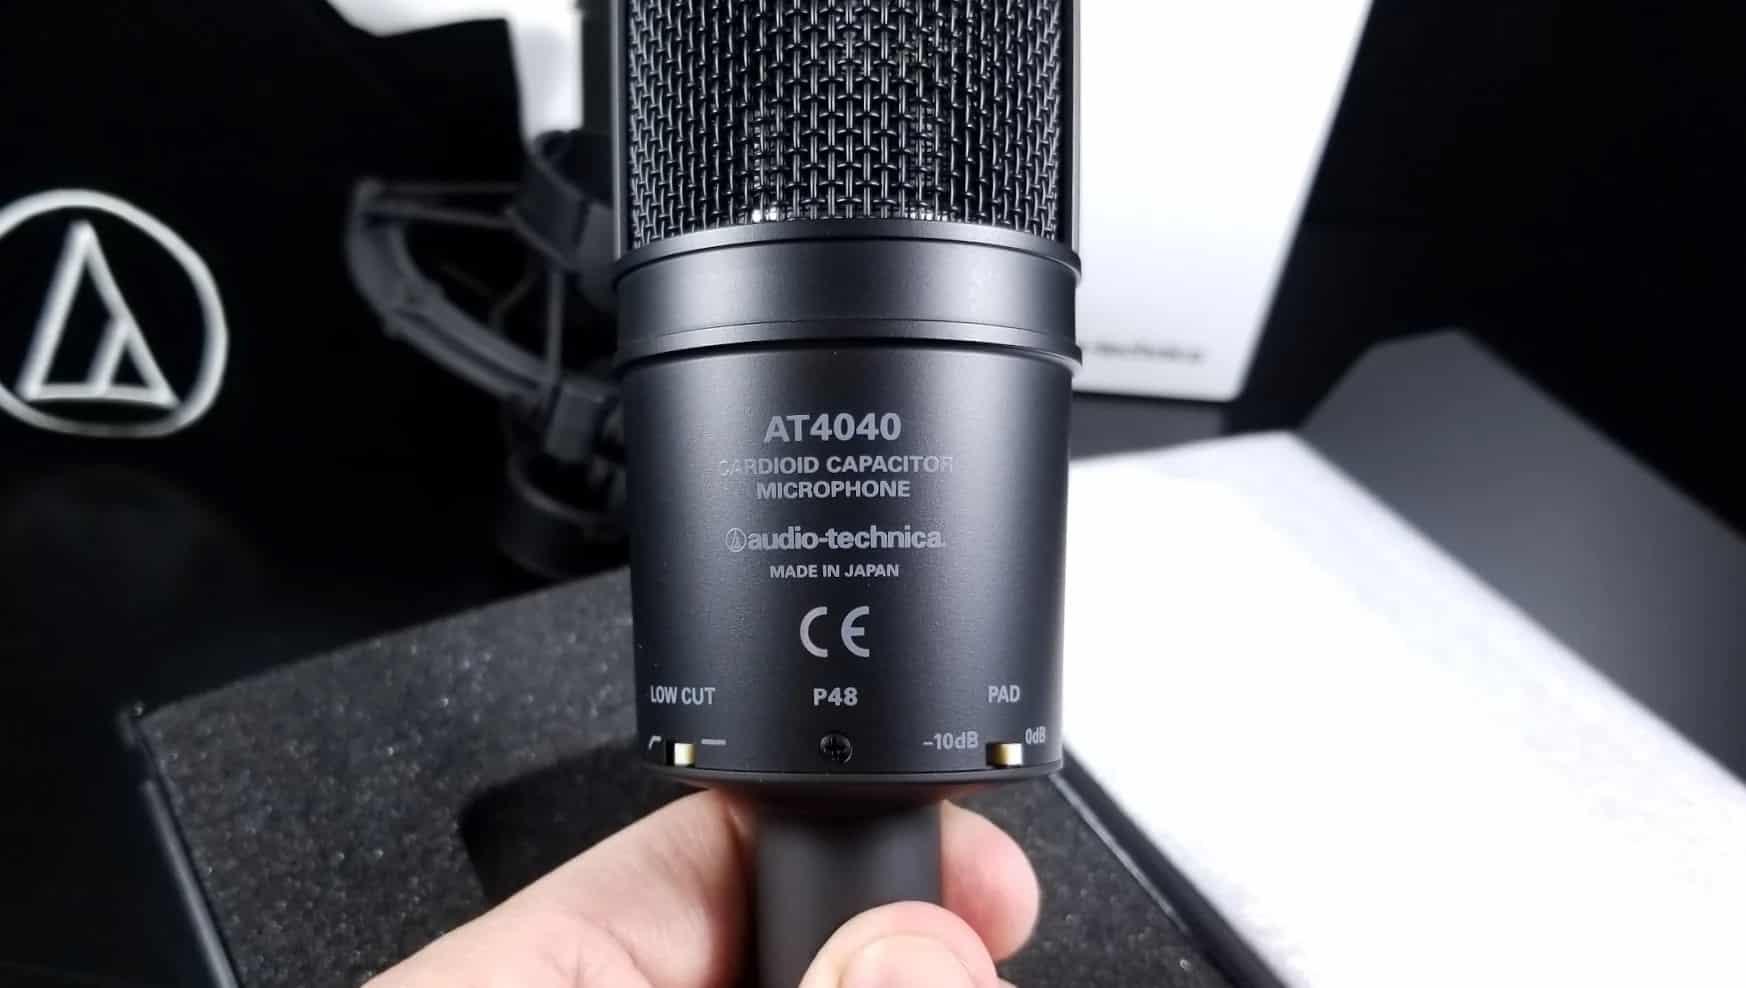 L'AT4040 d'Audio-Technica : Microphone cardio analogique